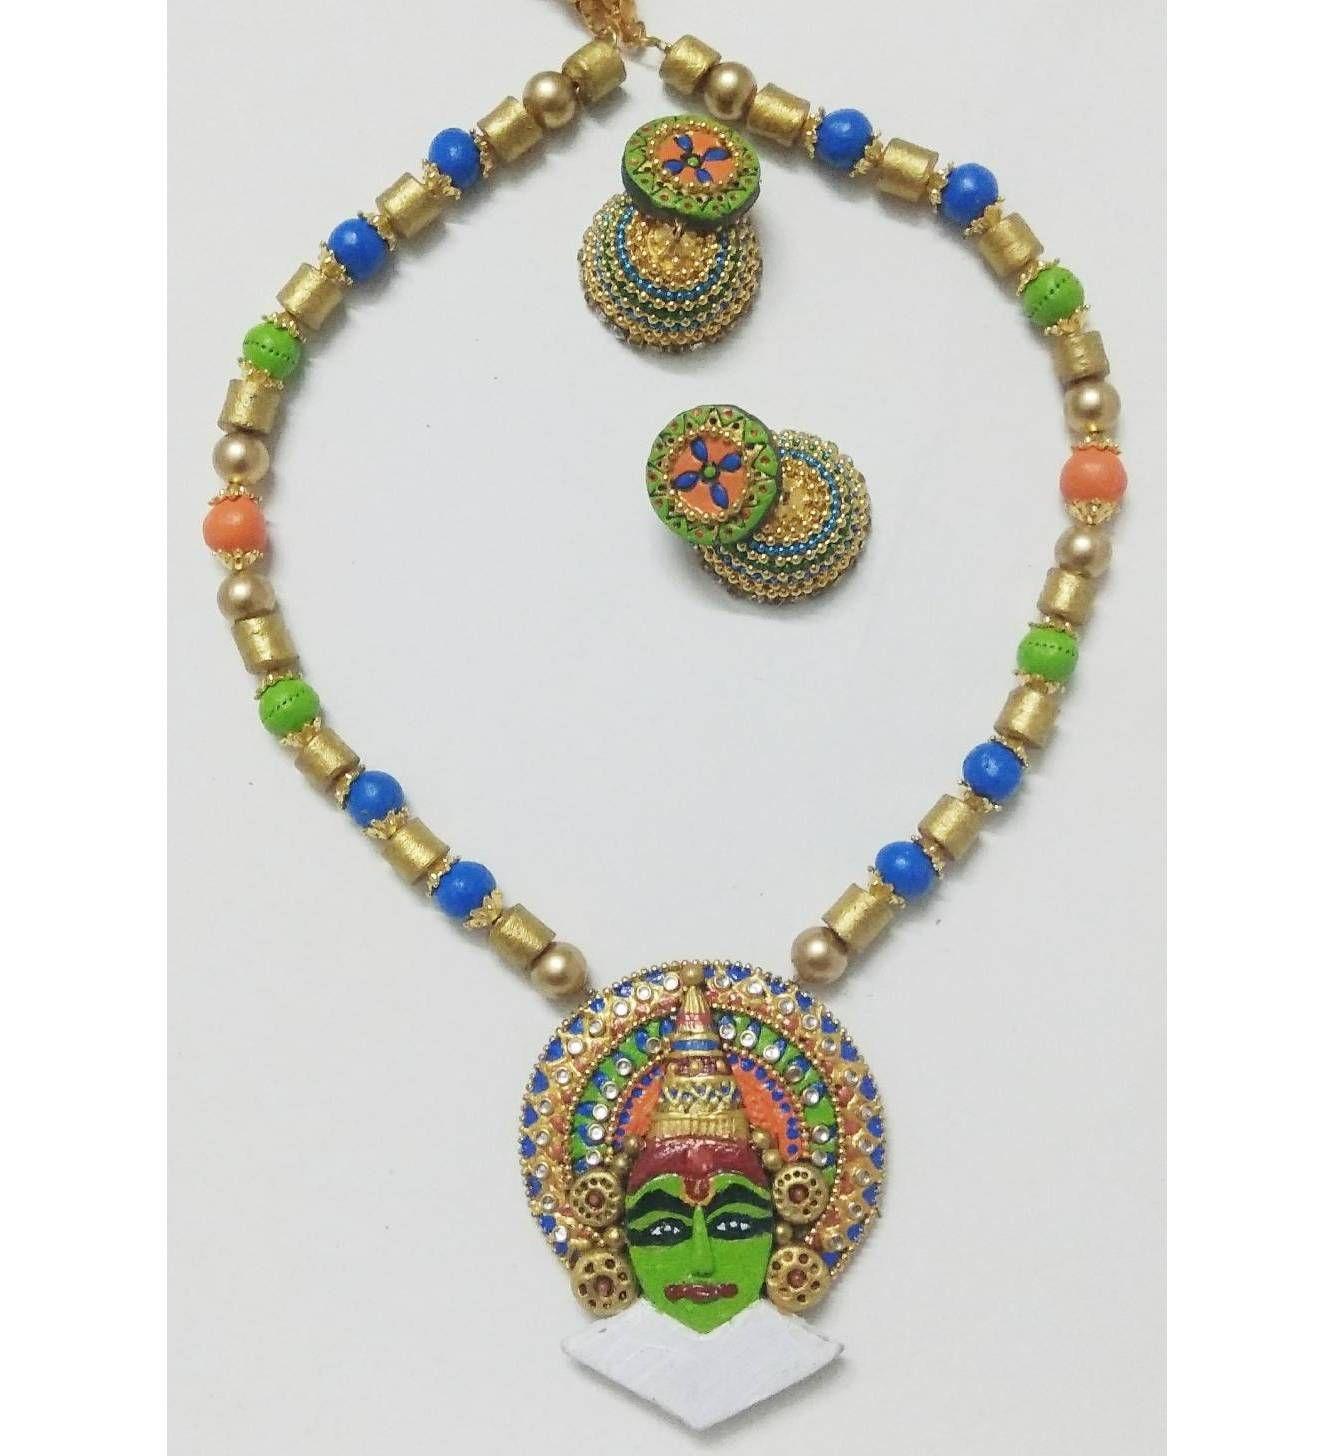 Buy Terracotta Handmade Jewelry Kerala Kathakali Design Online